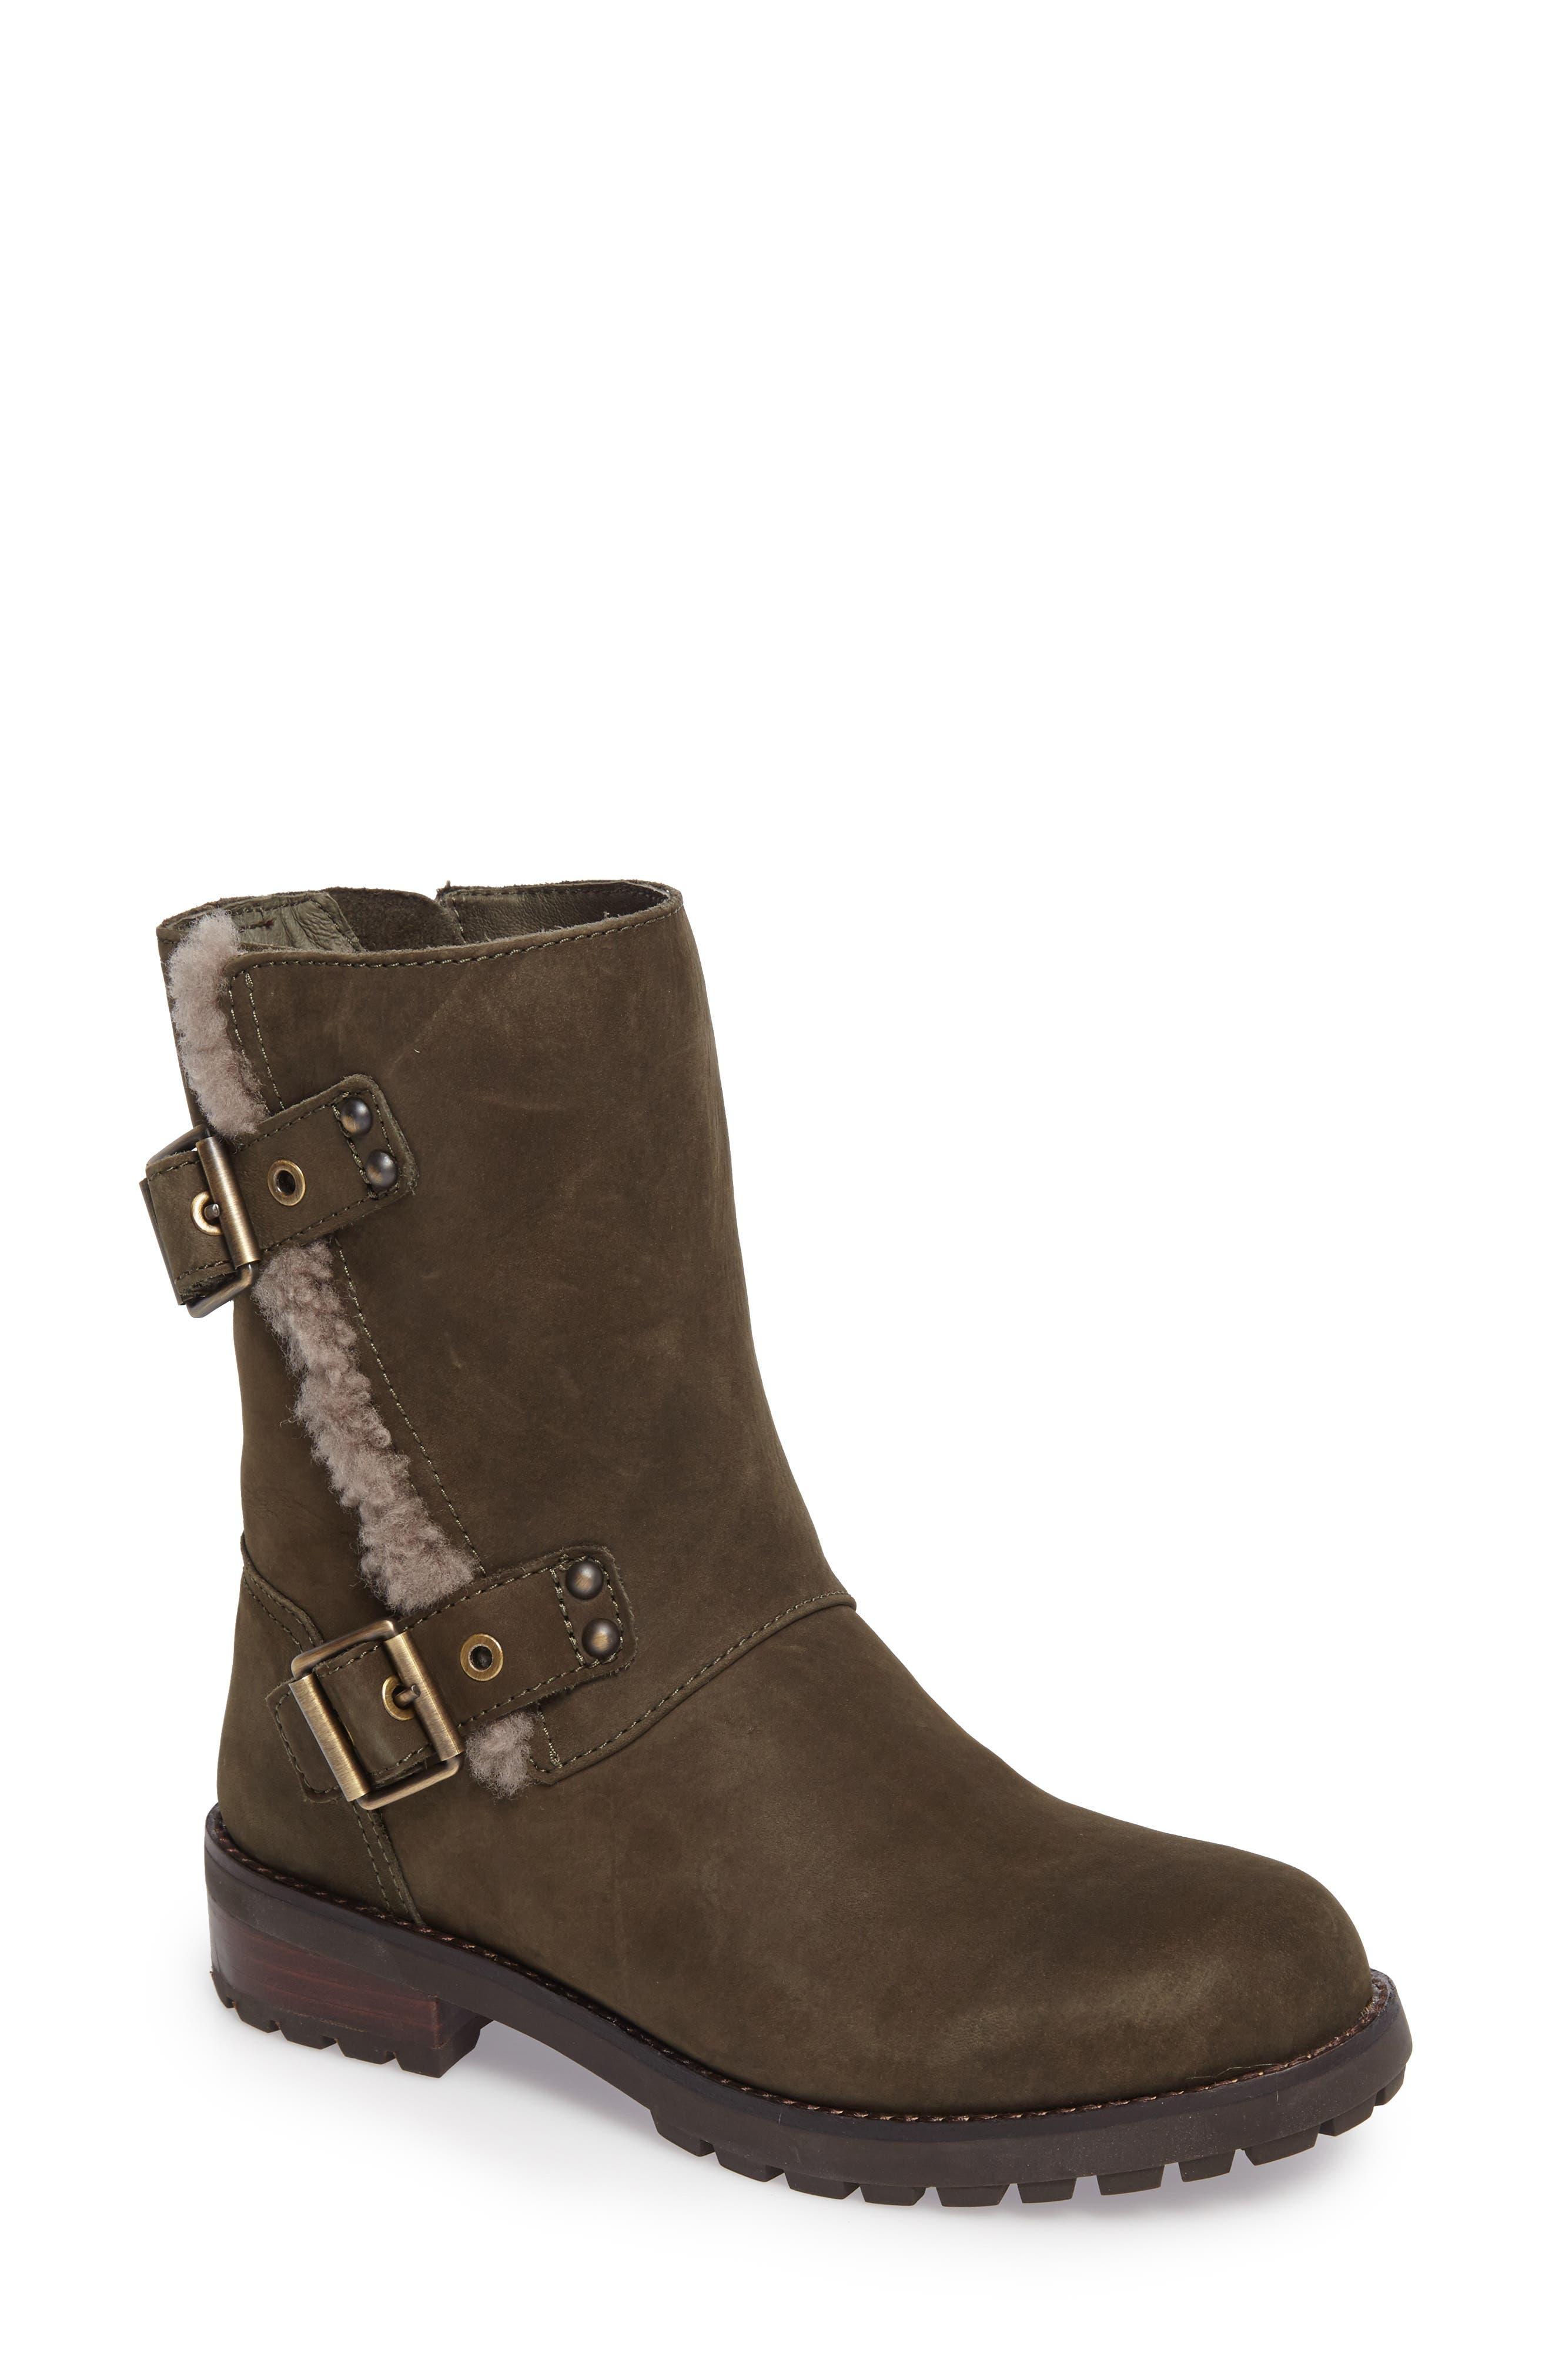 Main Image - UGG® Niels Water Resistant Genuine Shearling Boot (Women)